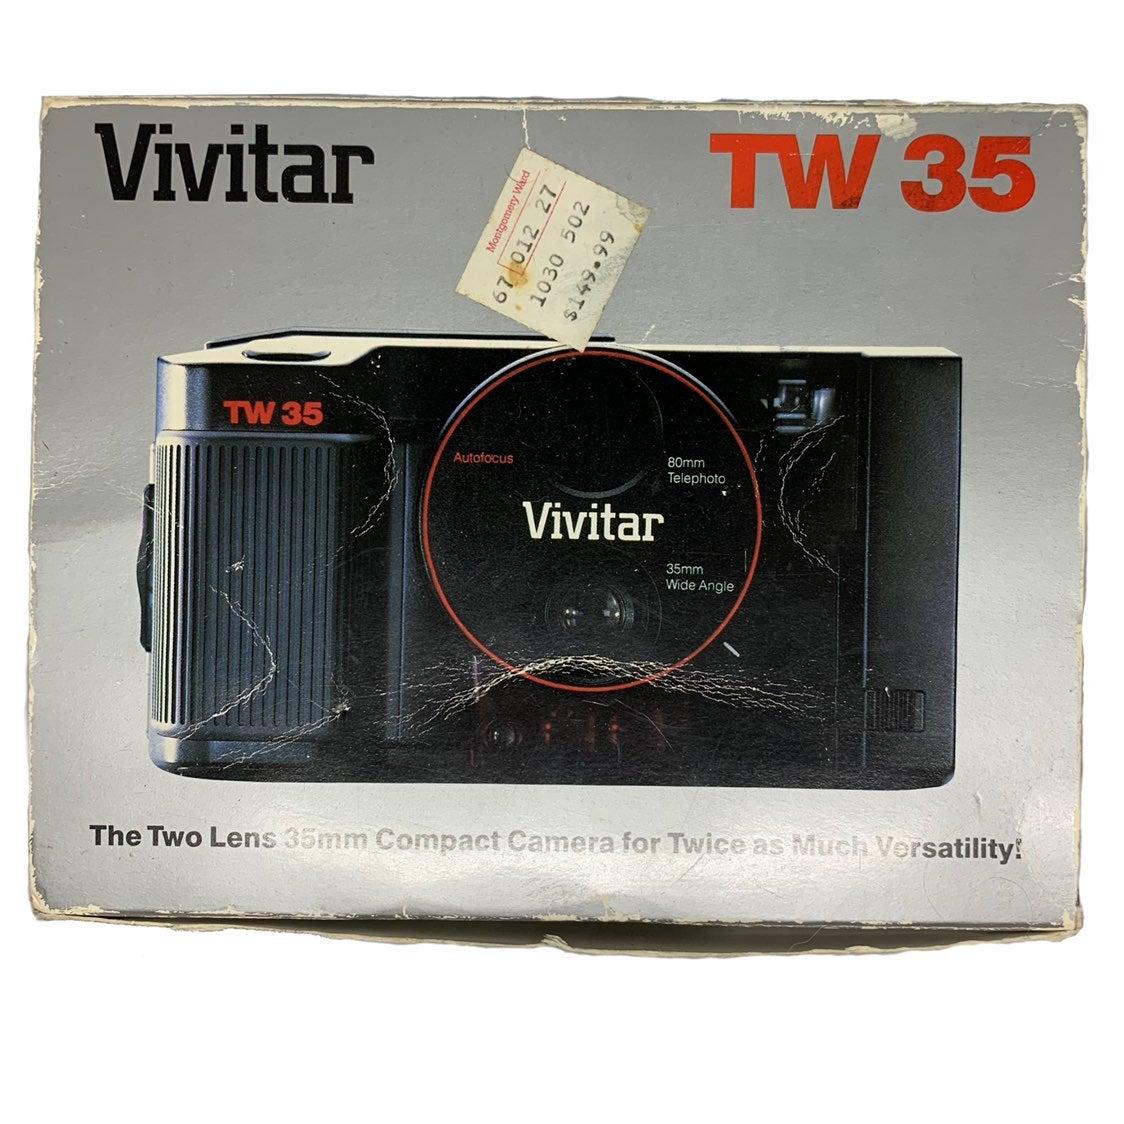 Vivitar TW 35 w/box and strap